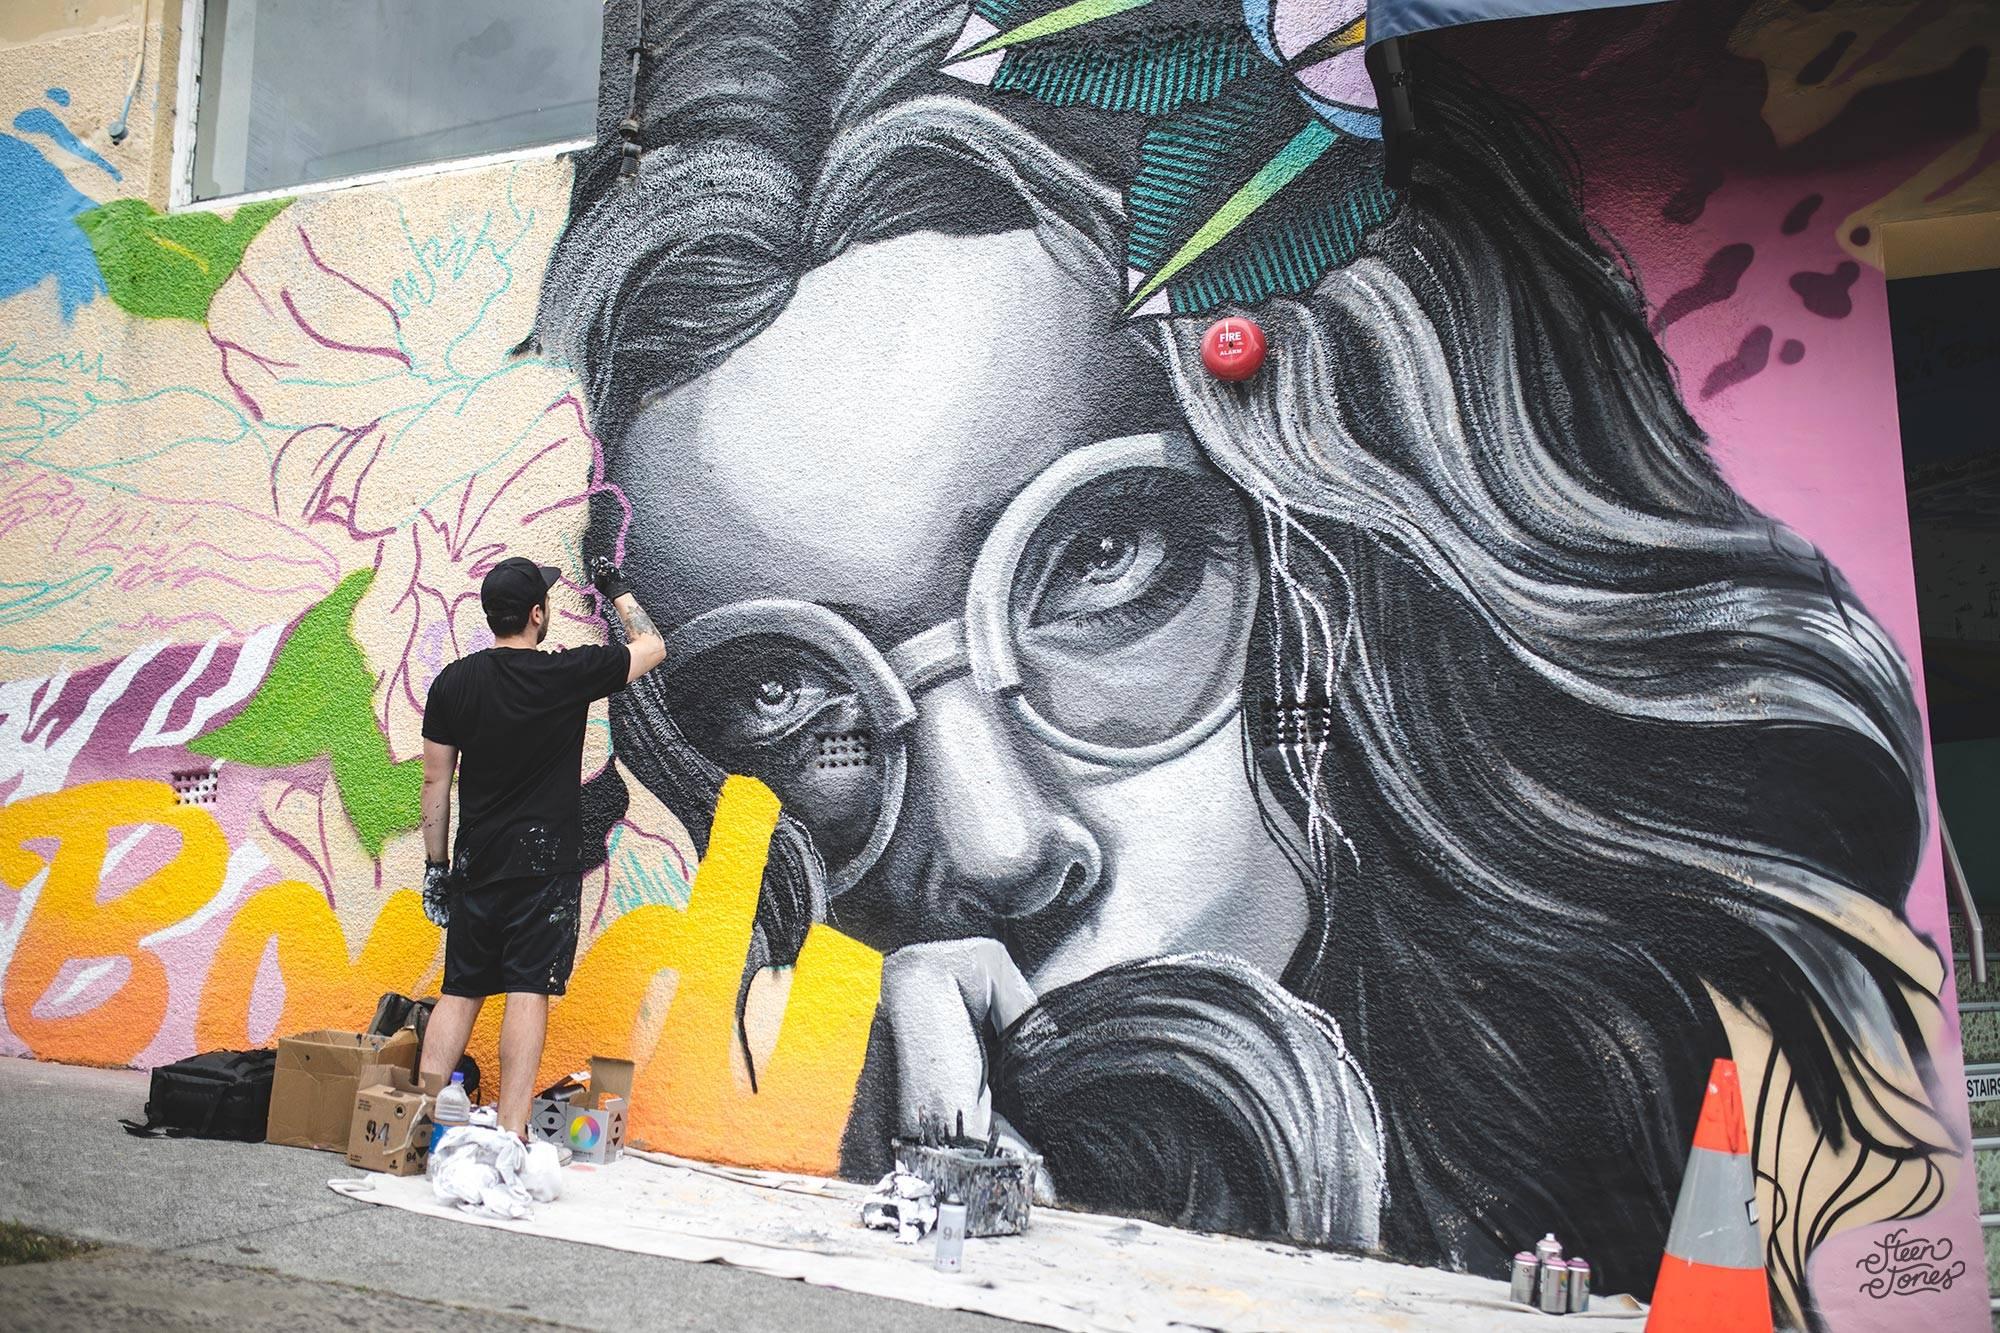 Steen Jones tattoo street artist Australia Authority Creative Alex Lehours Noahs Backpackers Hi from Bondi